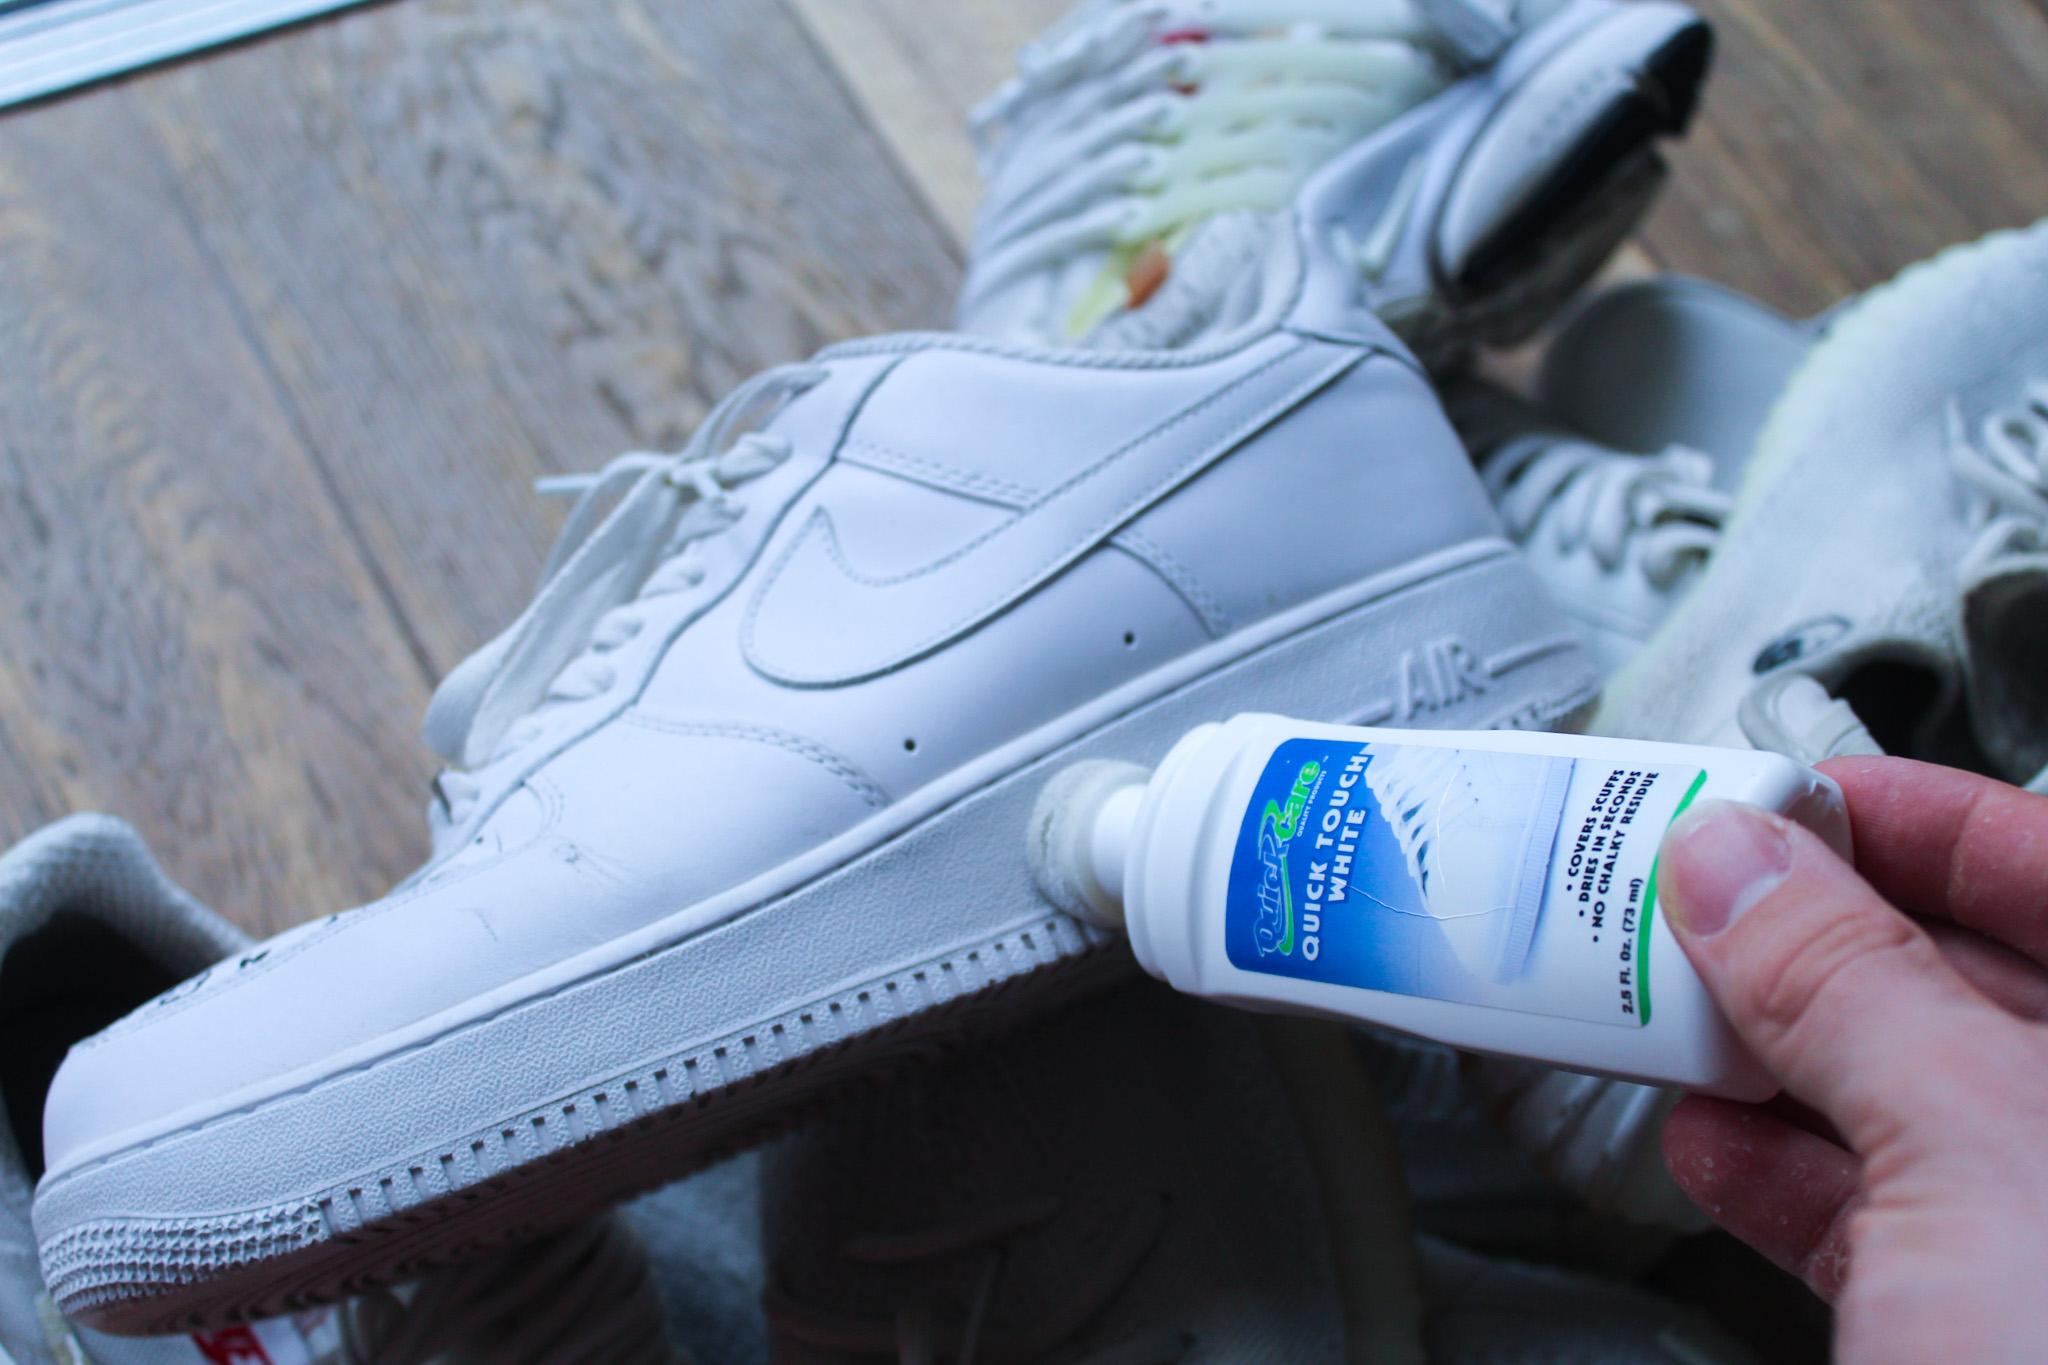 Freshpattas Sneaker whitening Stick